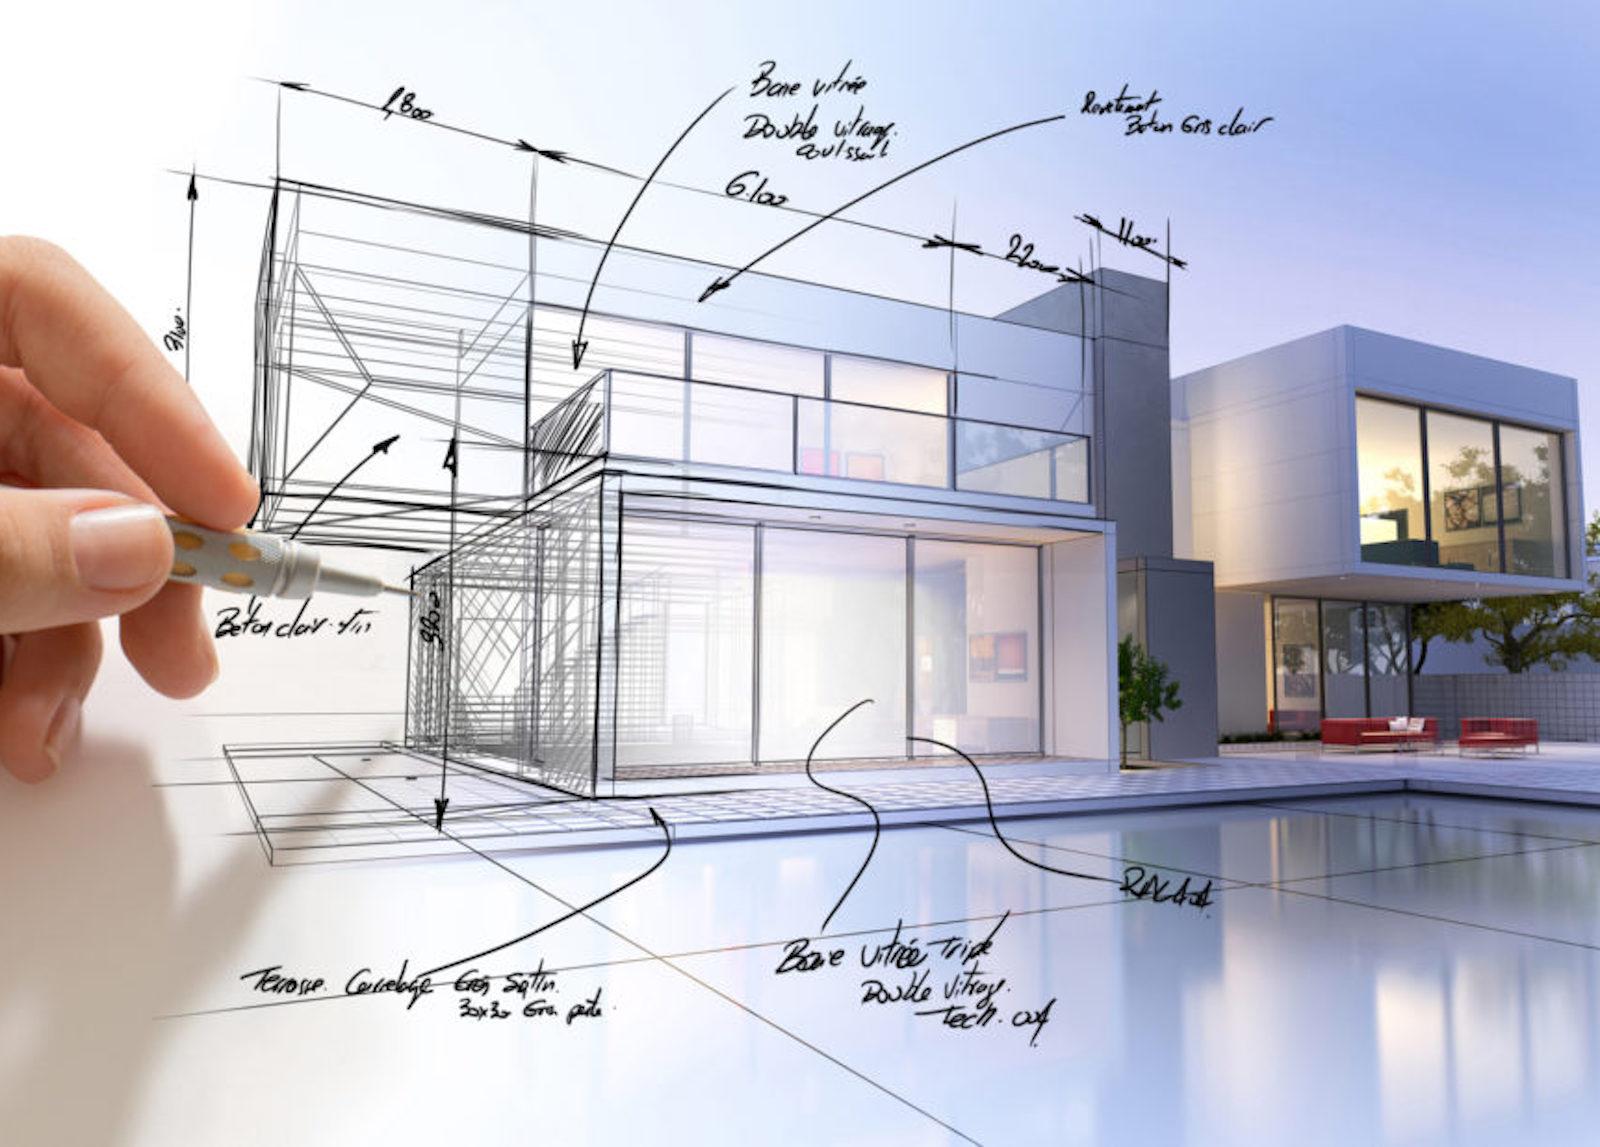 Guide To Denver S Home Renovation Scene